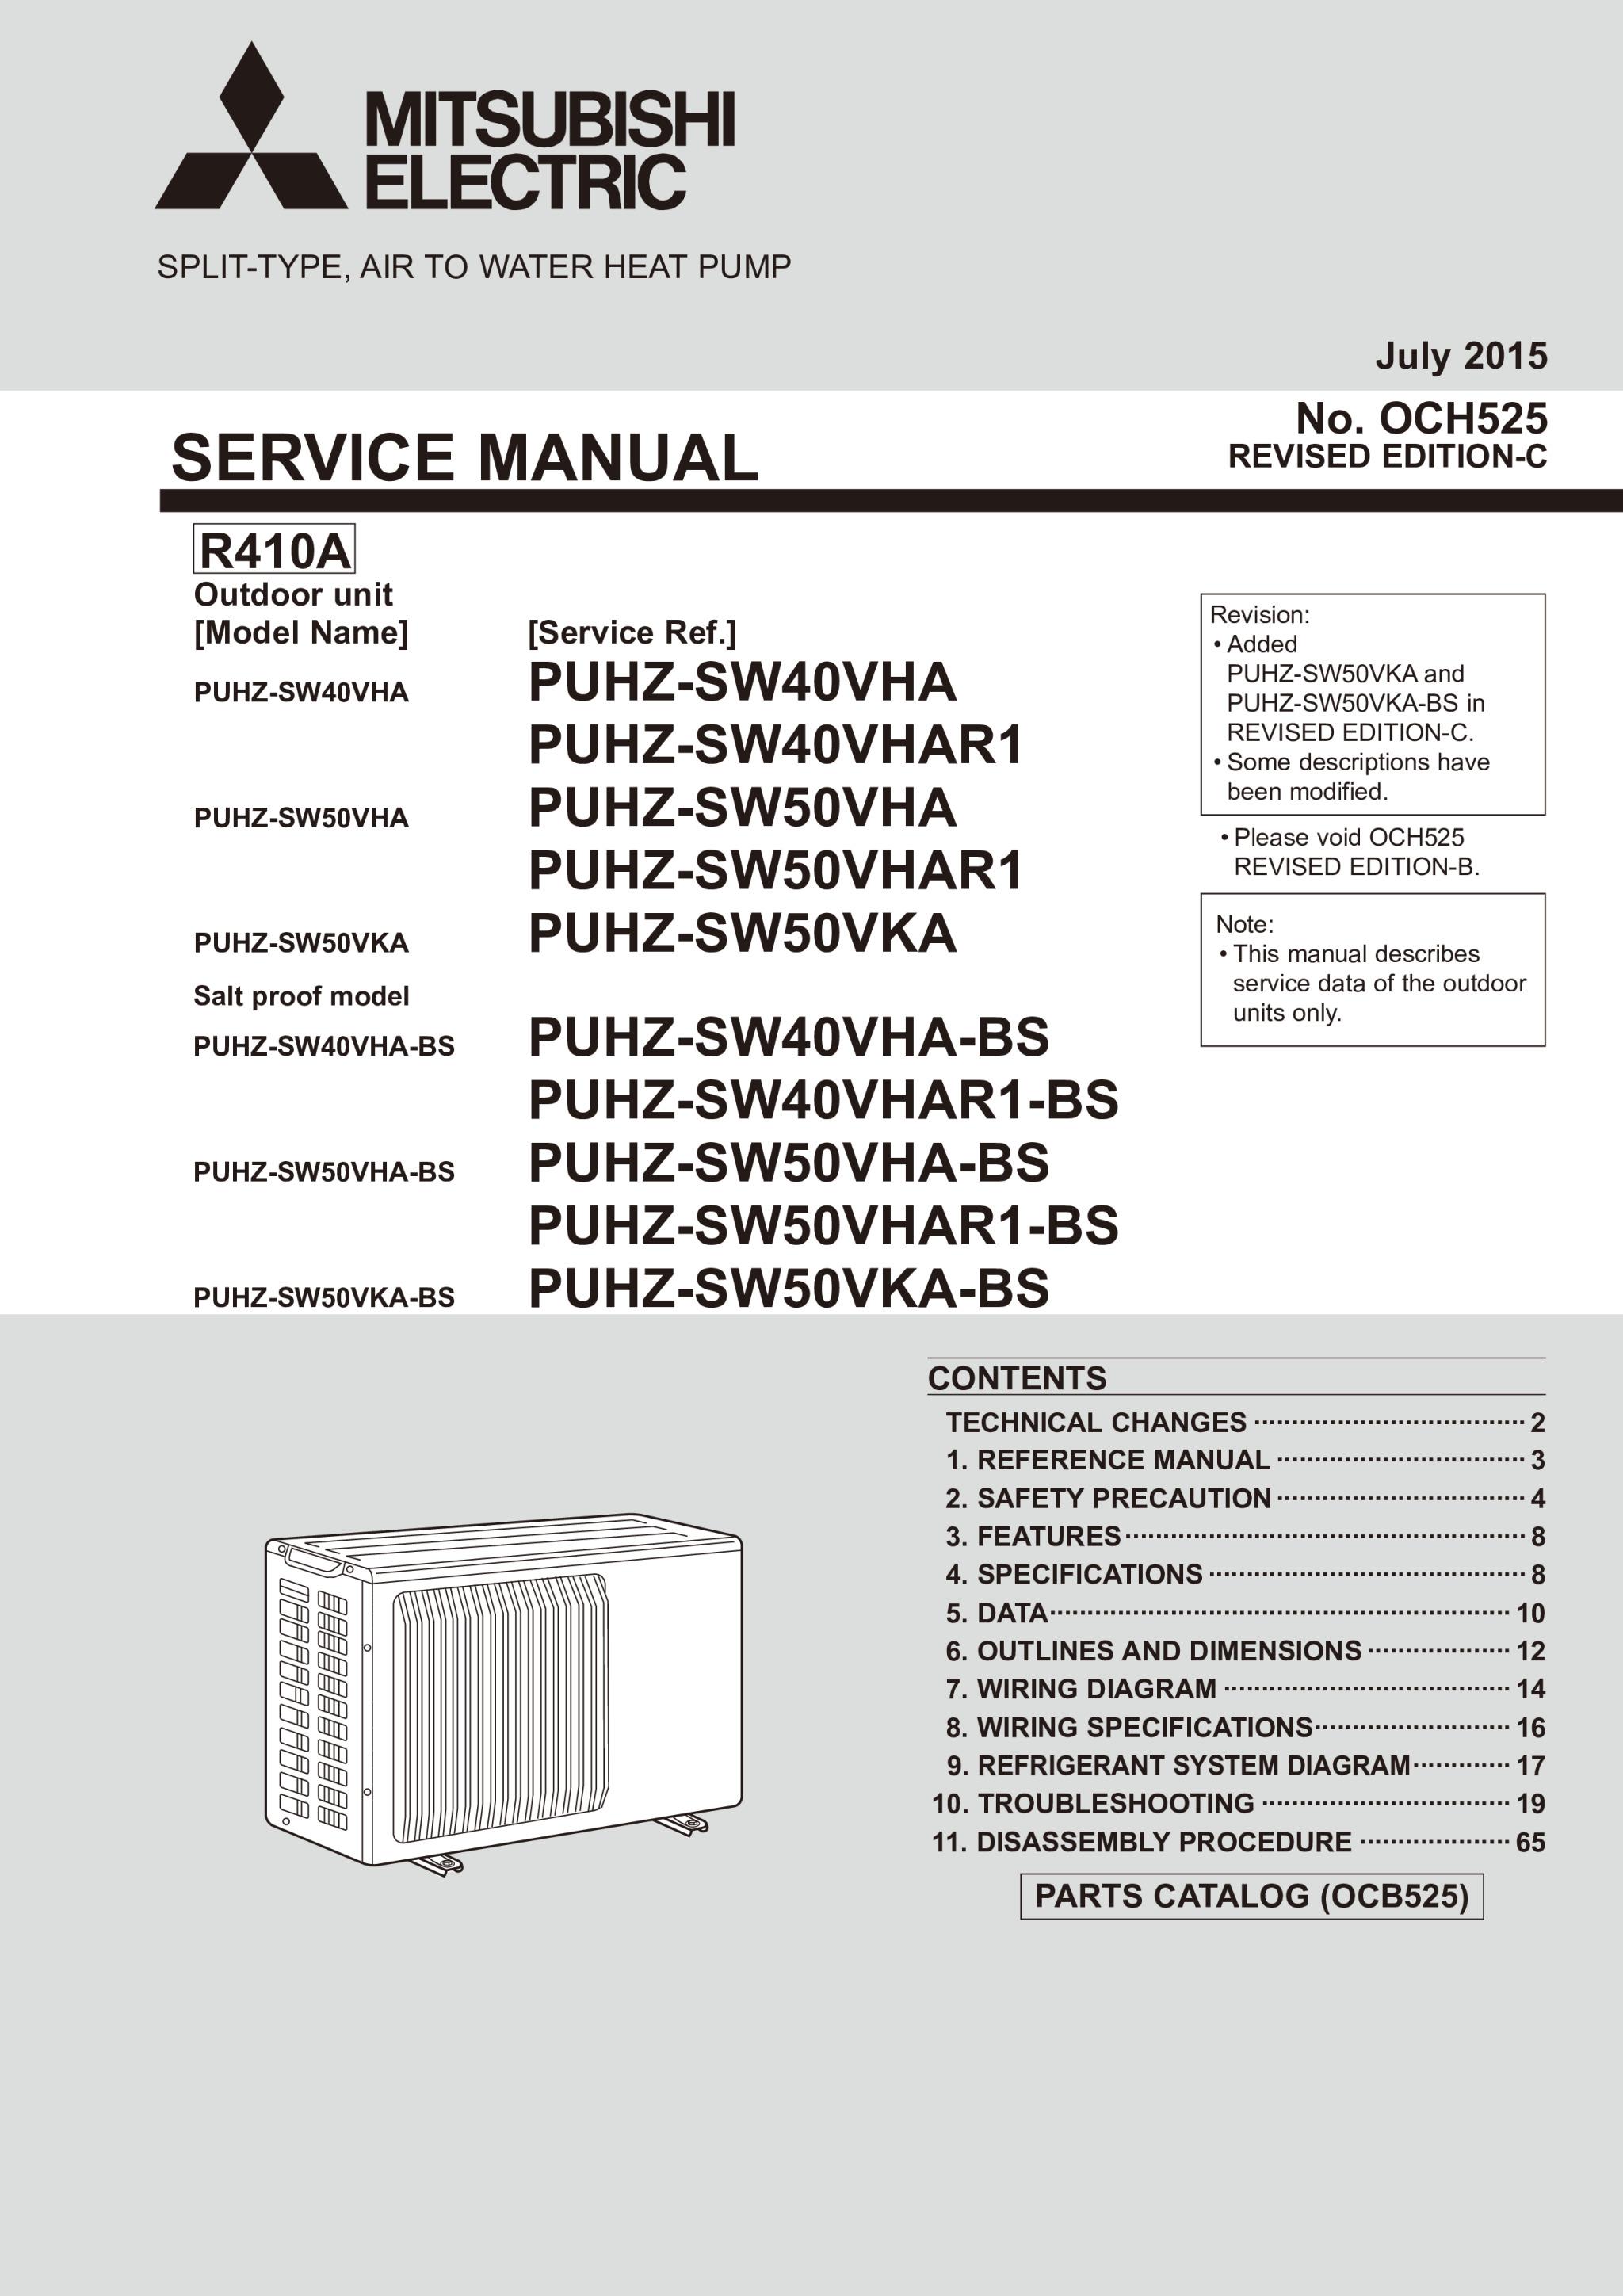 ecodan puhz sw50vka bs service manual och525c mitsubishi electric rh library mitsubishielectric co uk Mitsubishi Lancer Automatic or Manual mitsubishi electric ecodan user manual